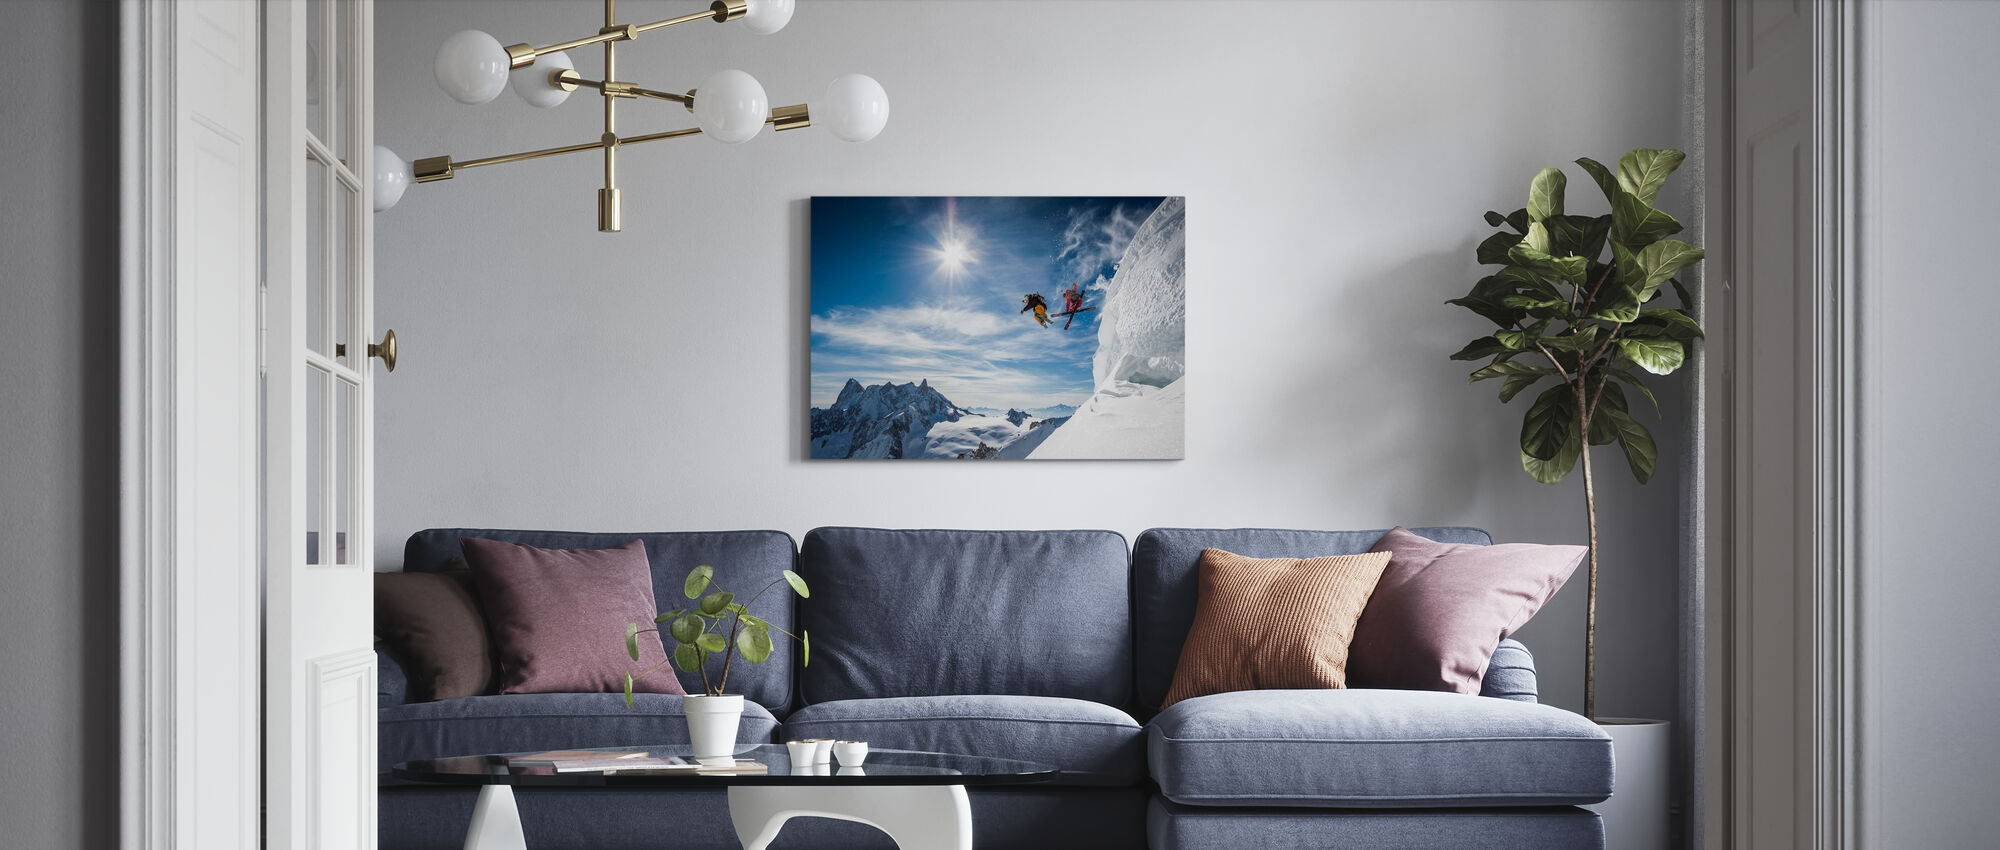 Jumping Legends - Canvas print - Living Room